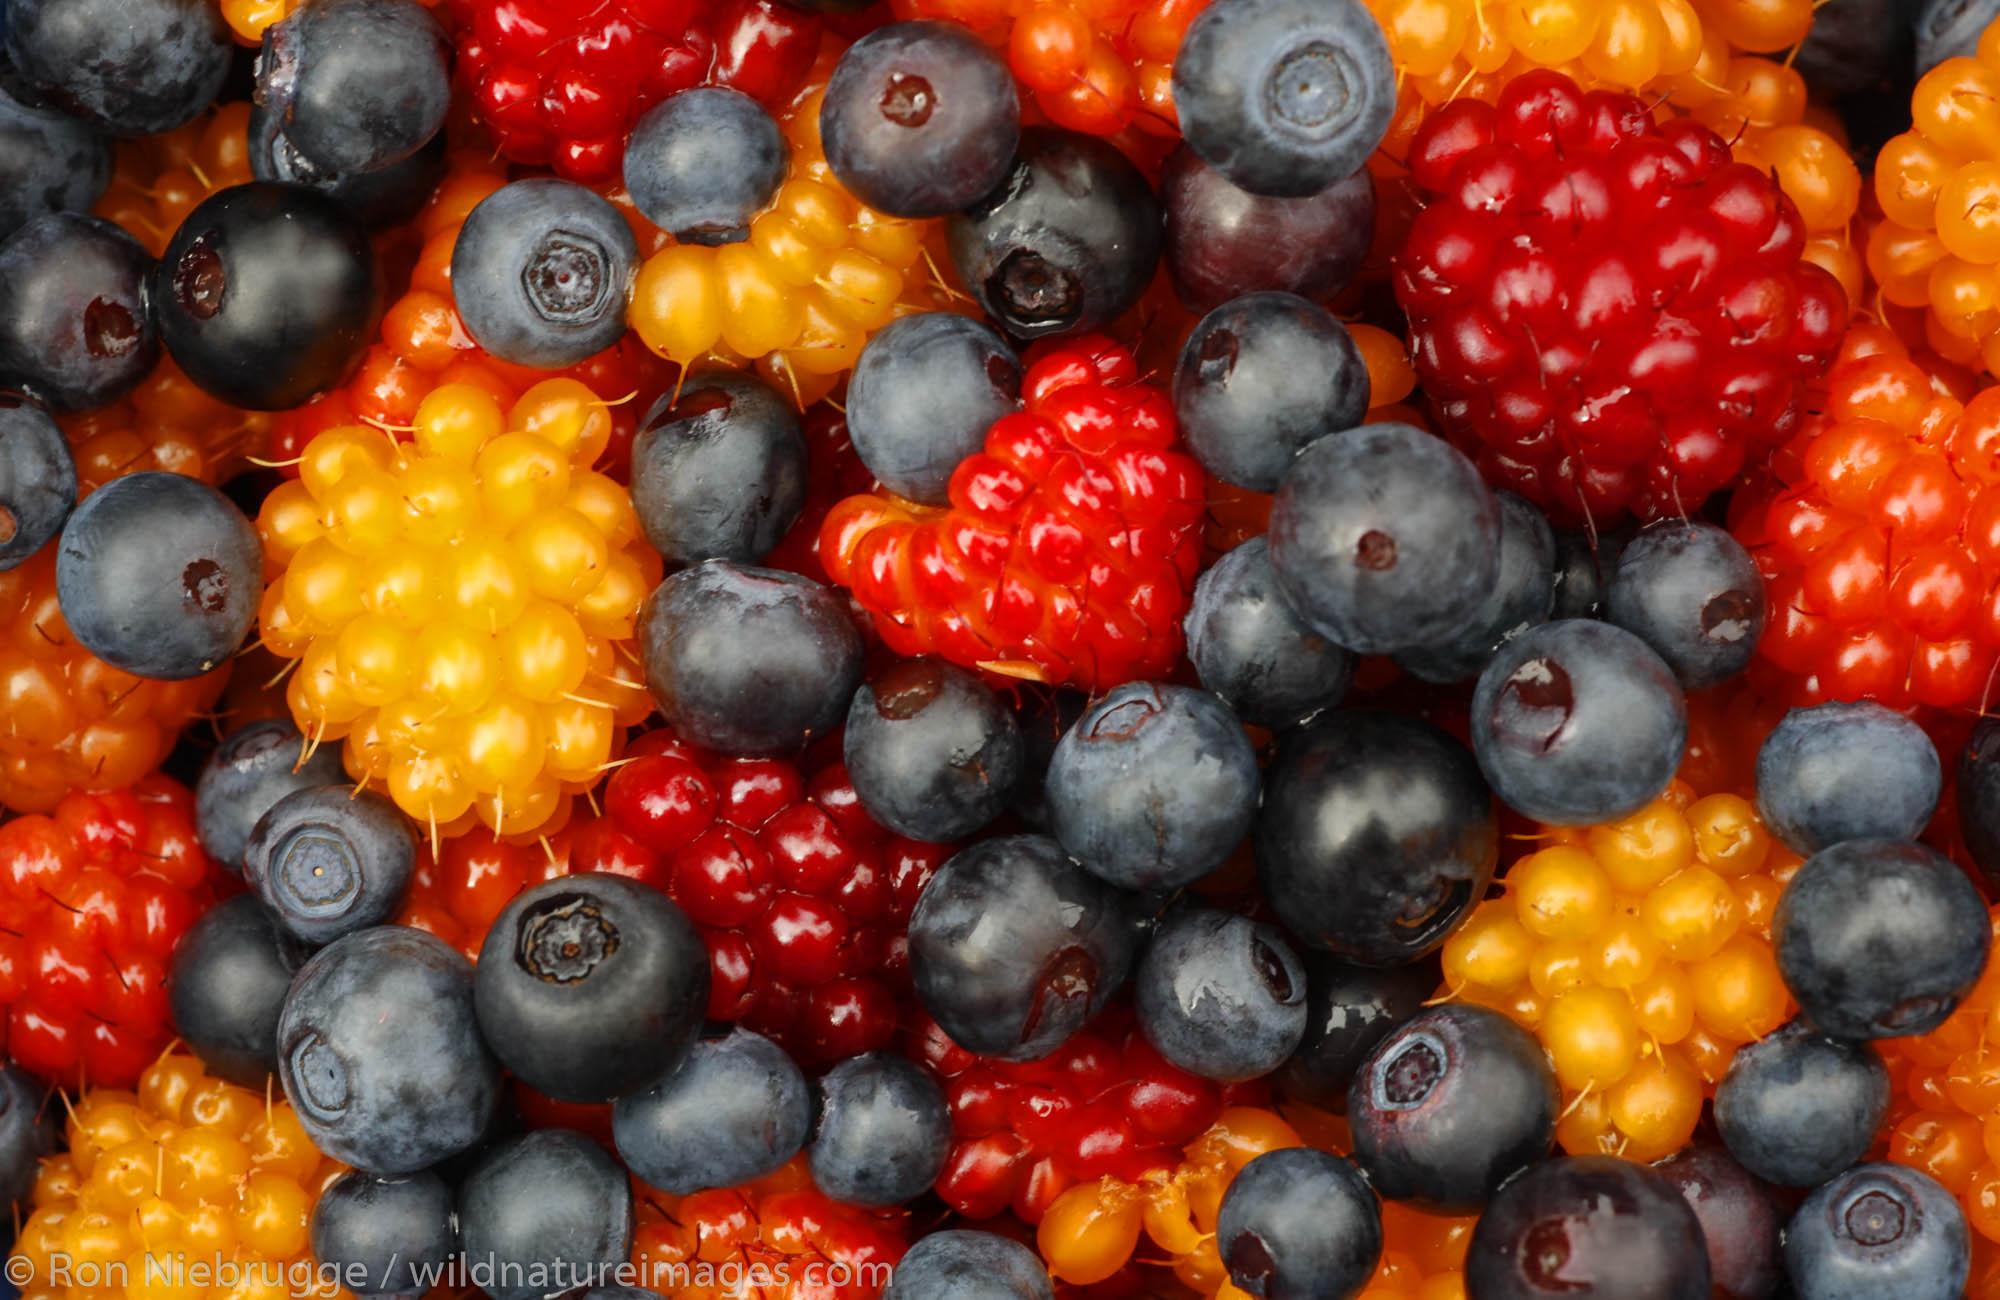 Colorful Berries, Prince William Sound, Chugach National Forest, Alaska.